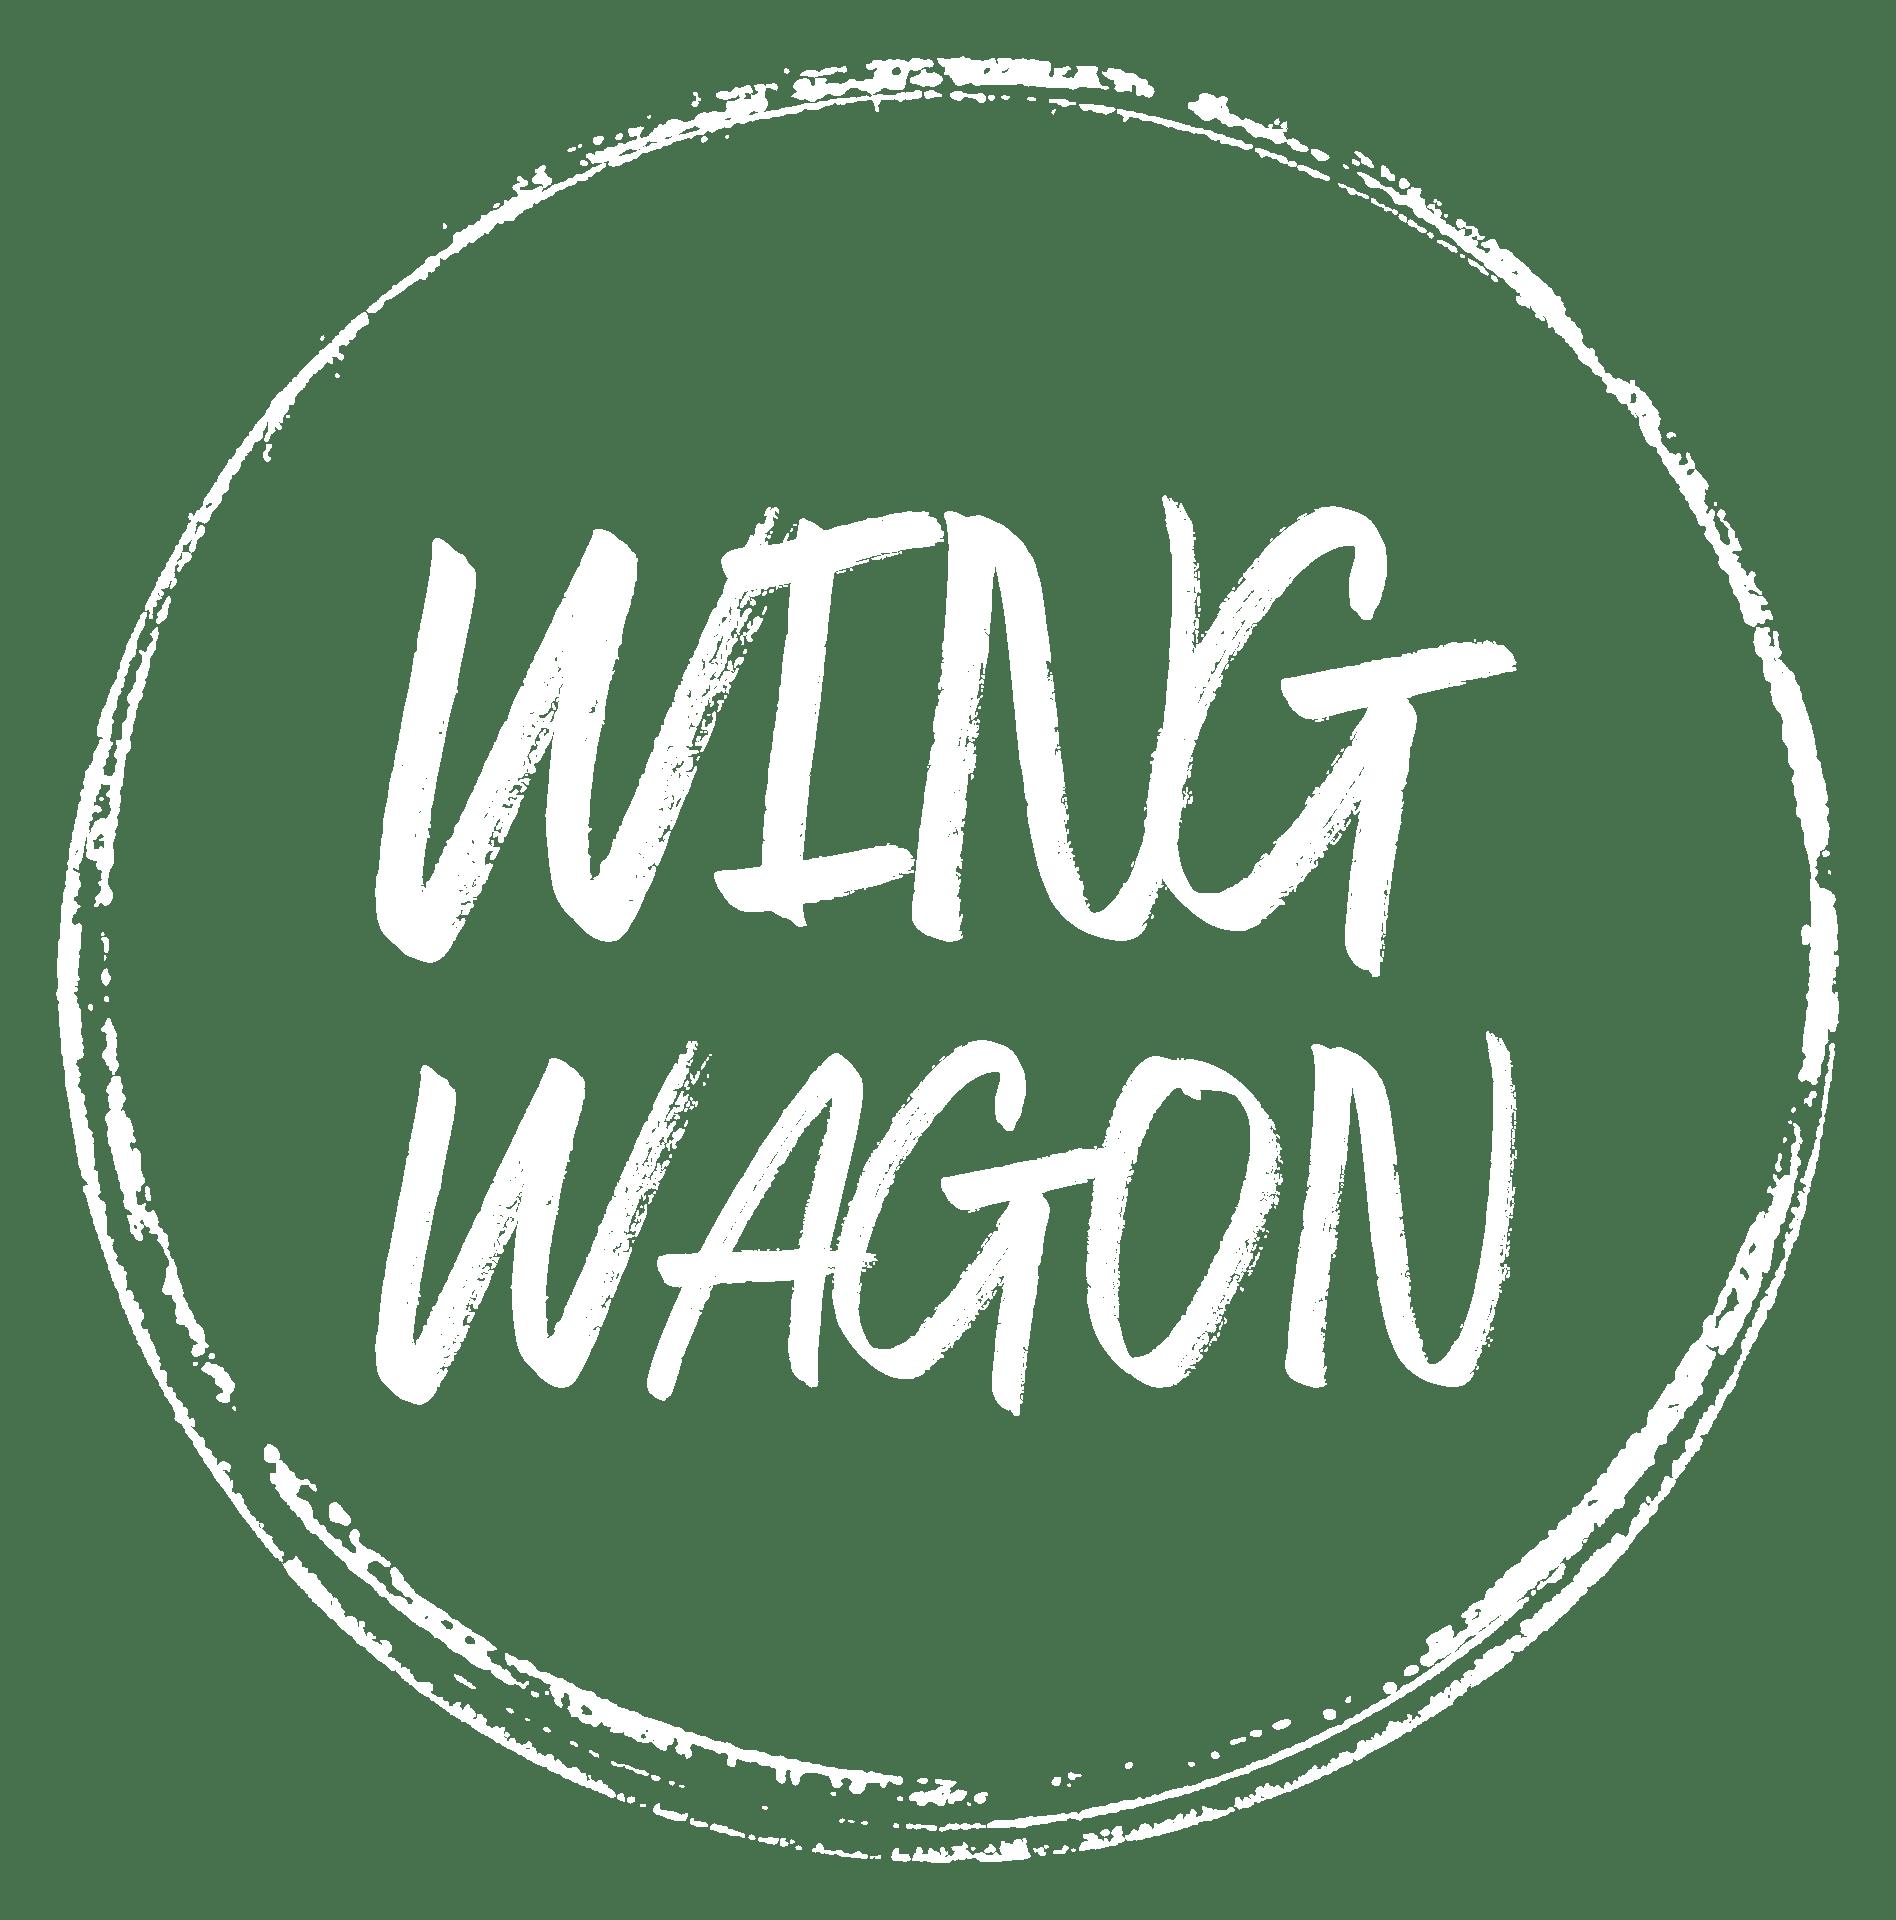 wing wagon logo